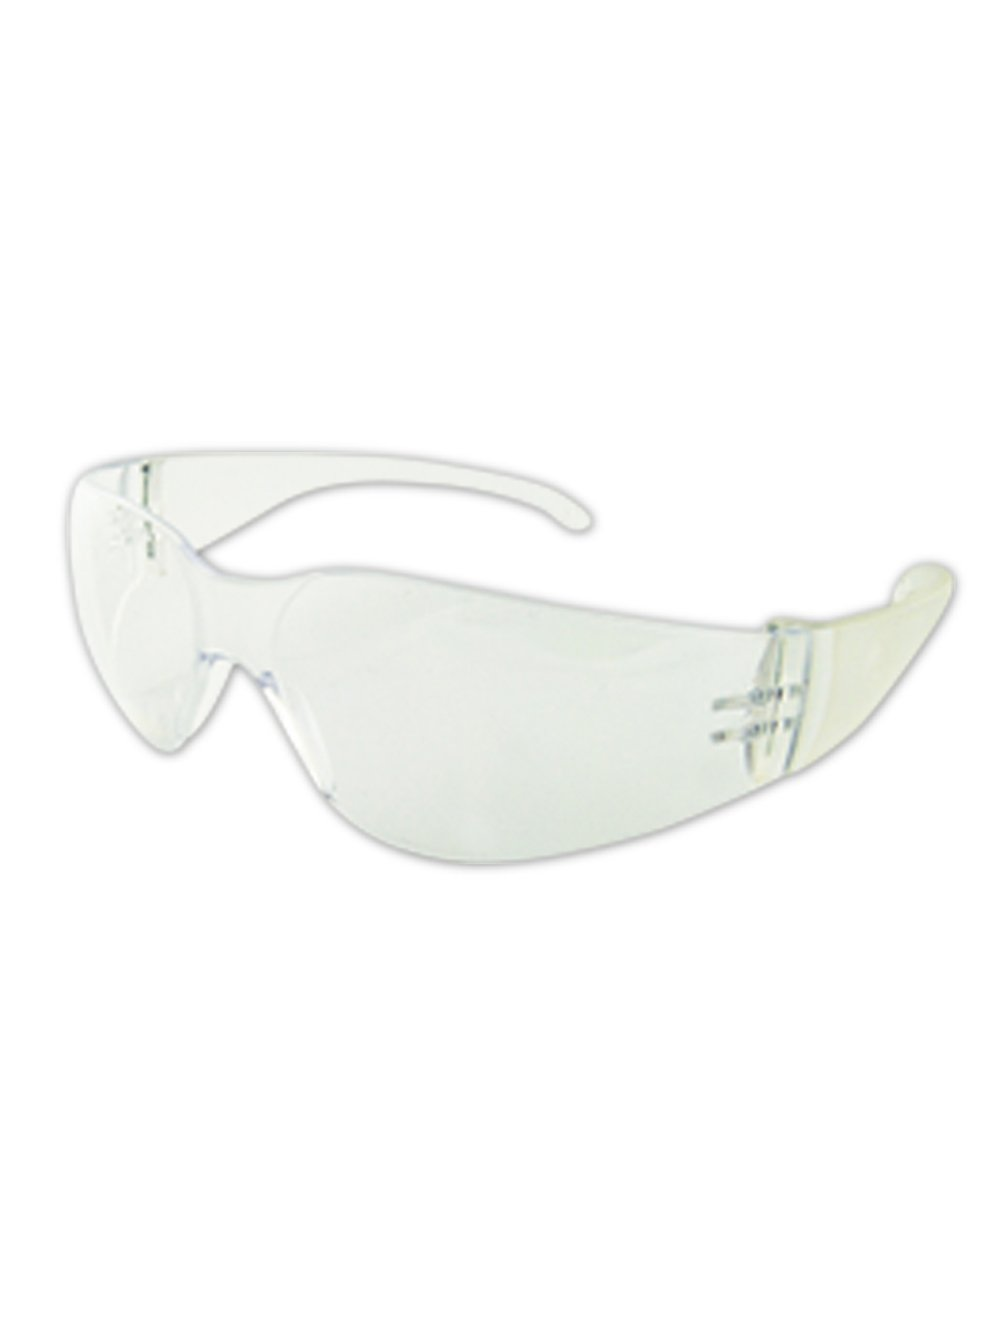 n-visiontm安全メガネ – n-vision安全GlassesblackグレーフレームCLR B004HMKKUM